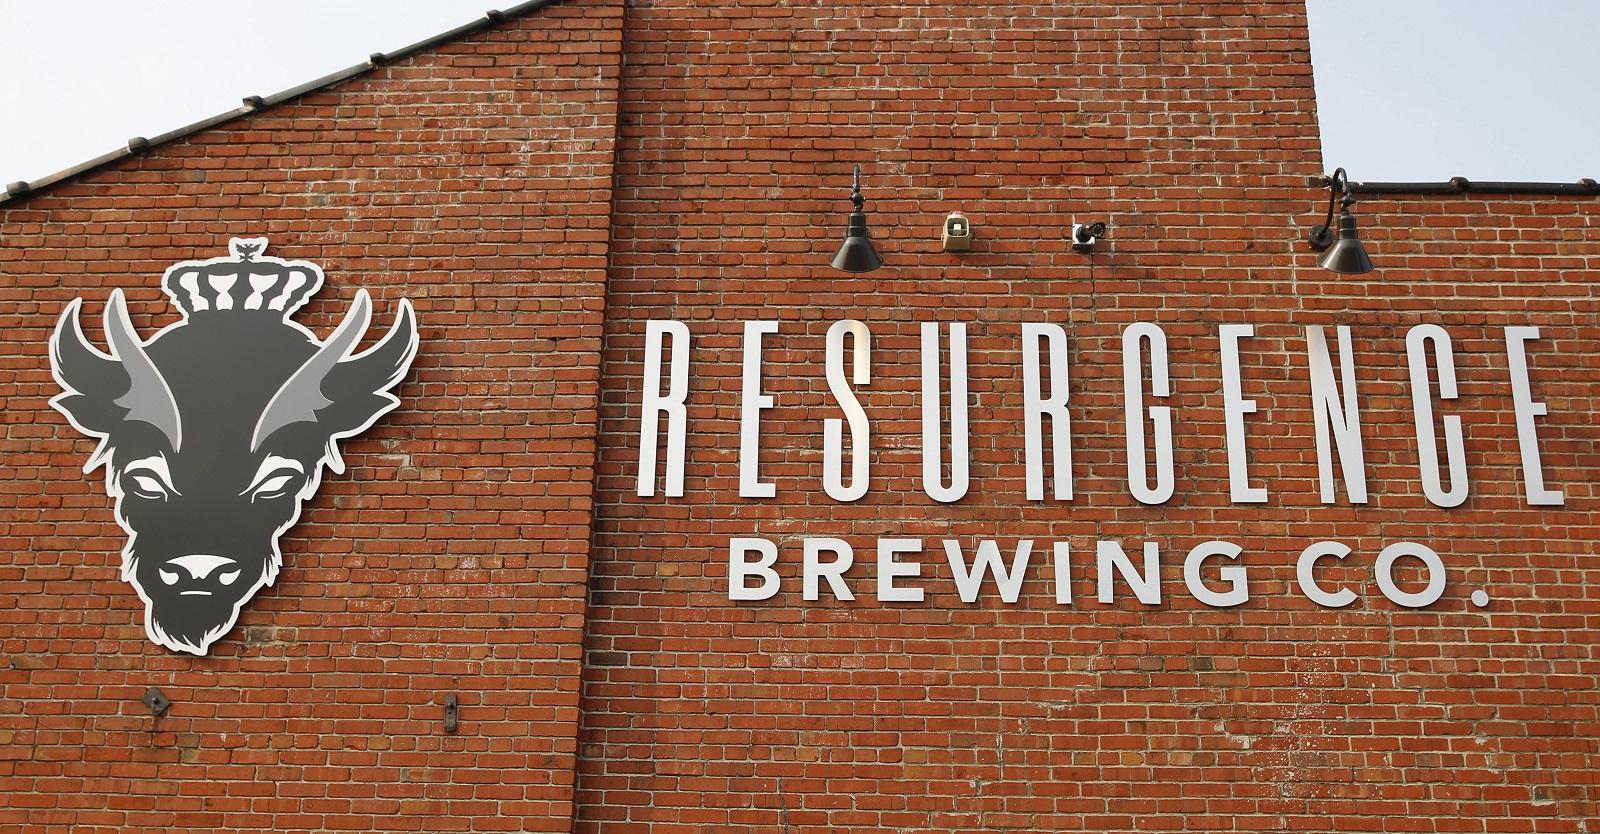 Resurgence Brewing Co. at 1250 Niagara St. has been part of the brewery boom in Buffalo. (Sharon Cantillon/Buffalo News)